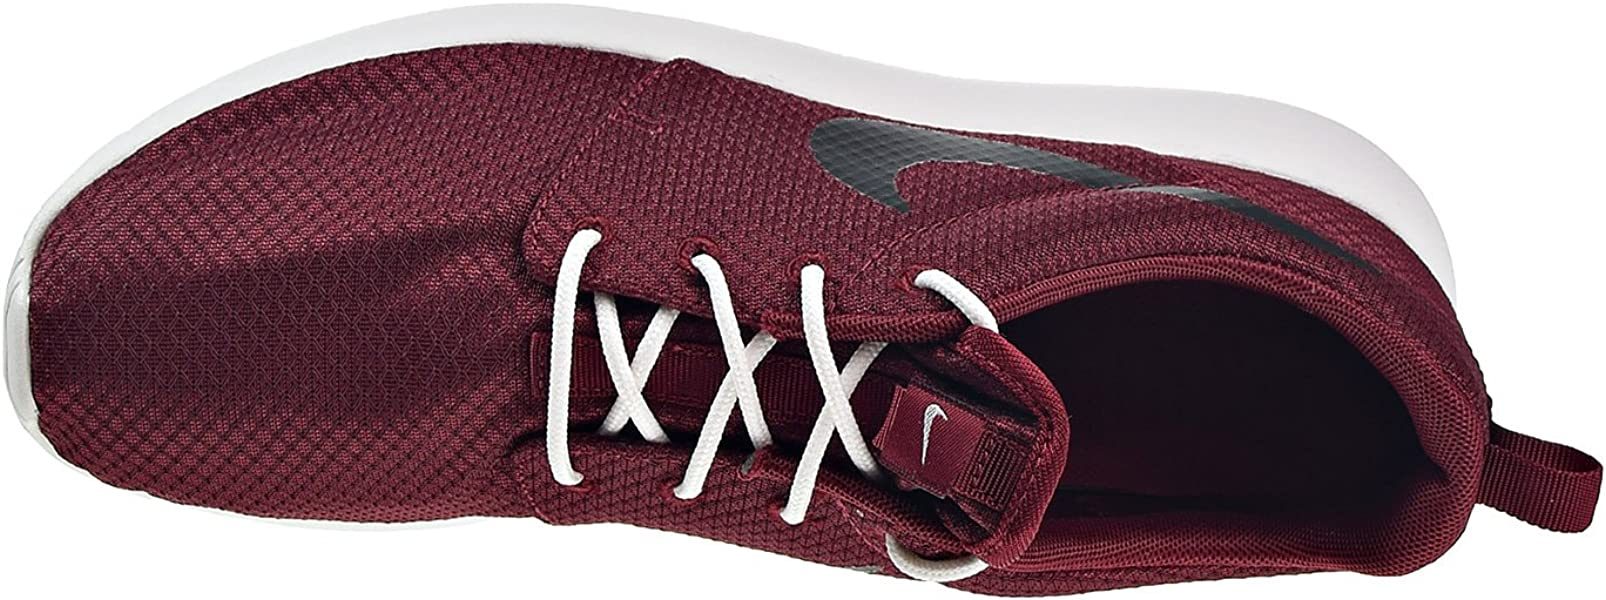 b76b201fbdc NIKE Roshe One Mens Shoes Team Red Black Summit White 511881-607 (12 ...